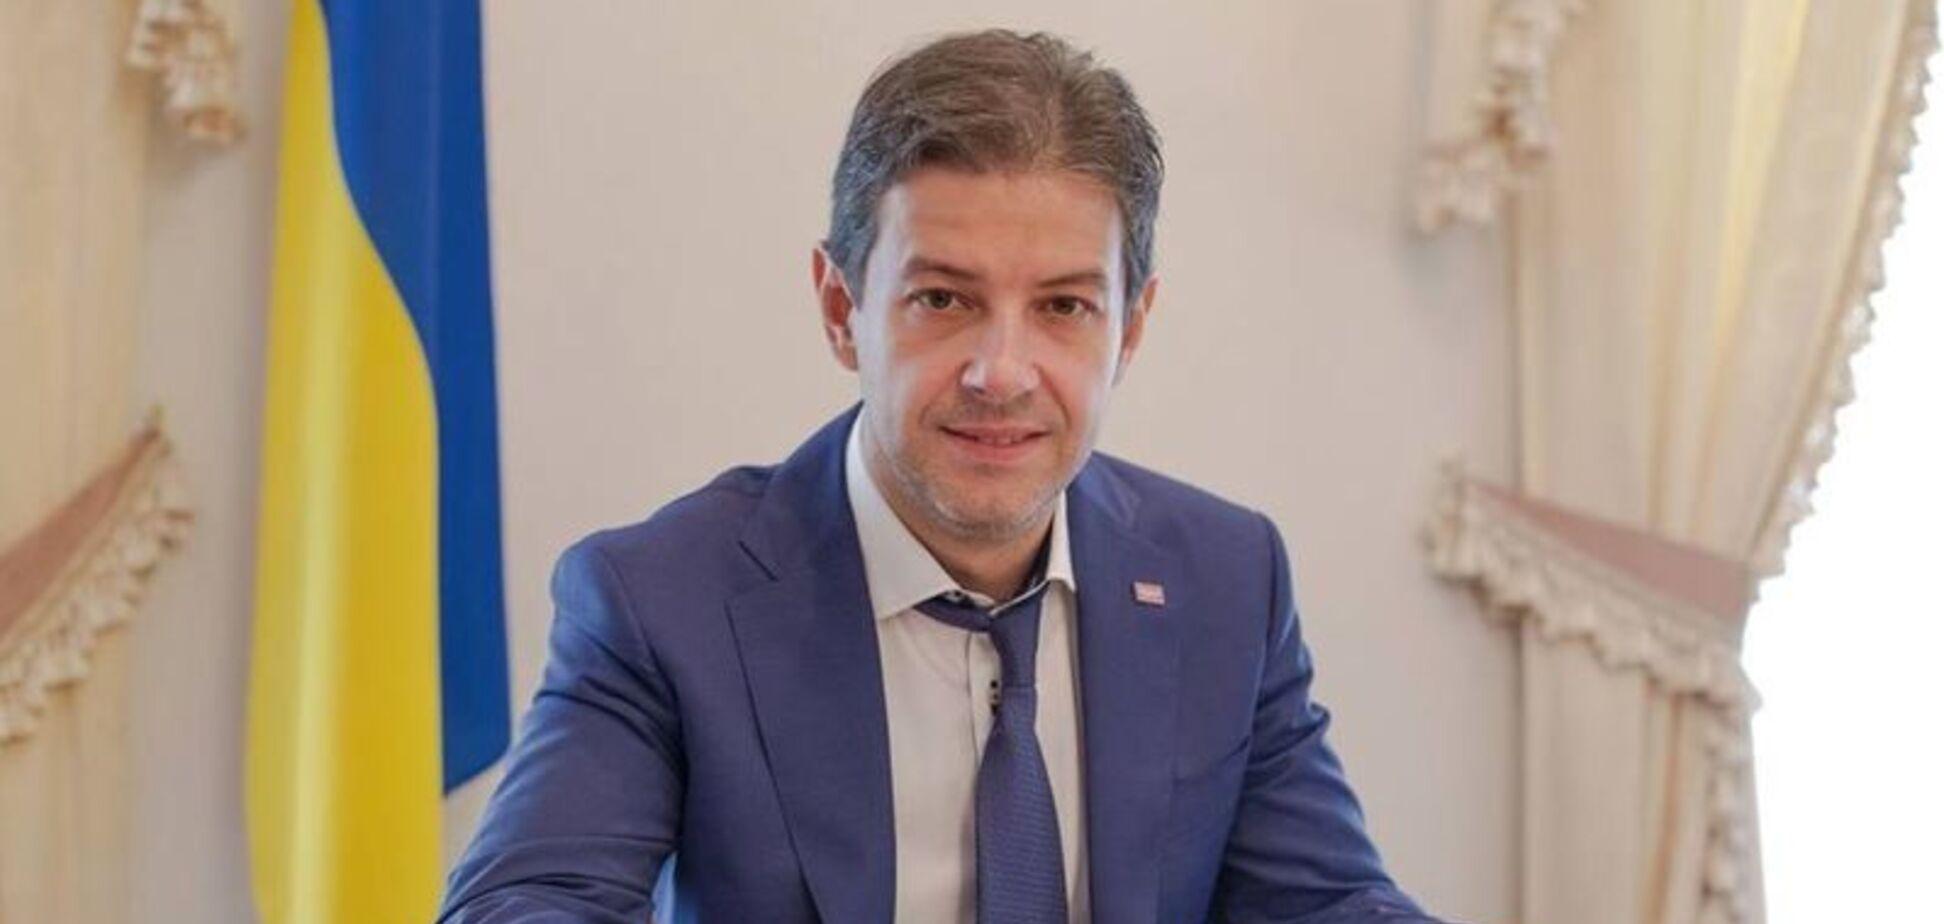 Депутат от ЕС Сергей Алексеев